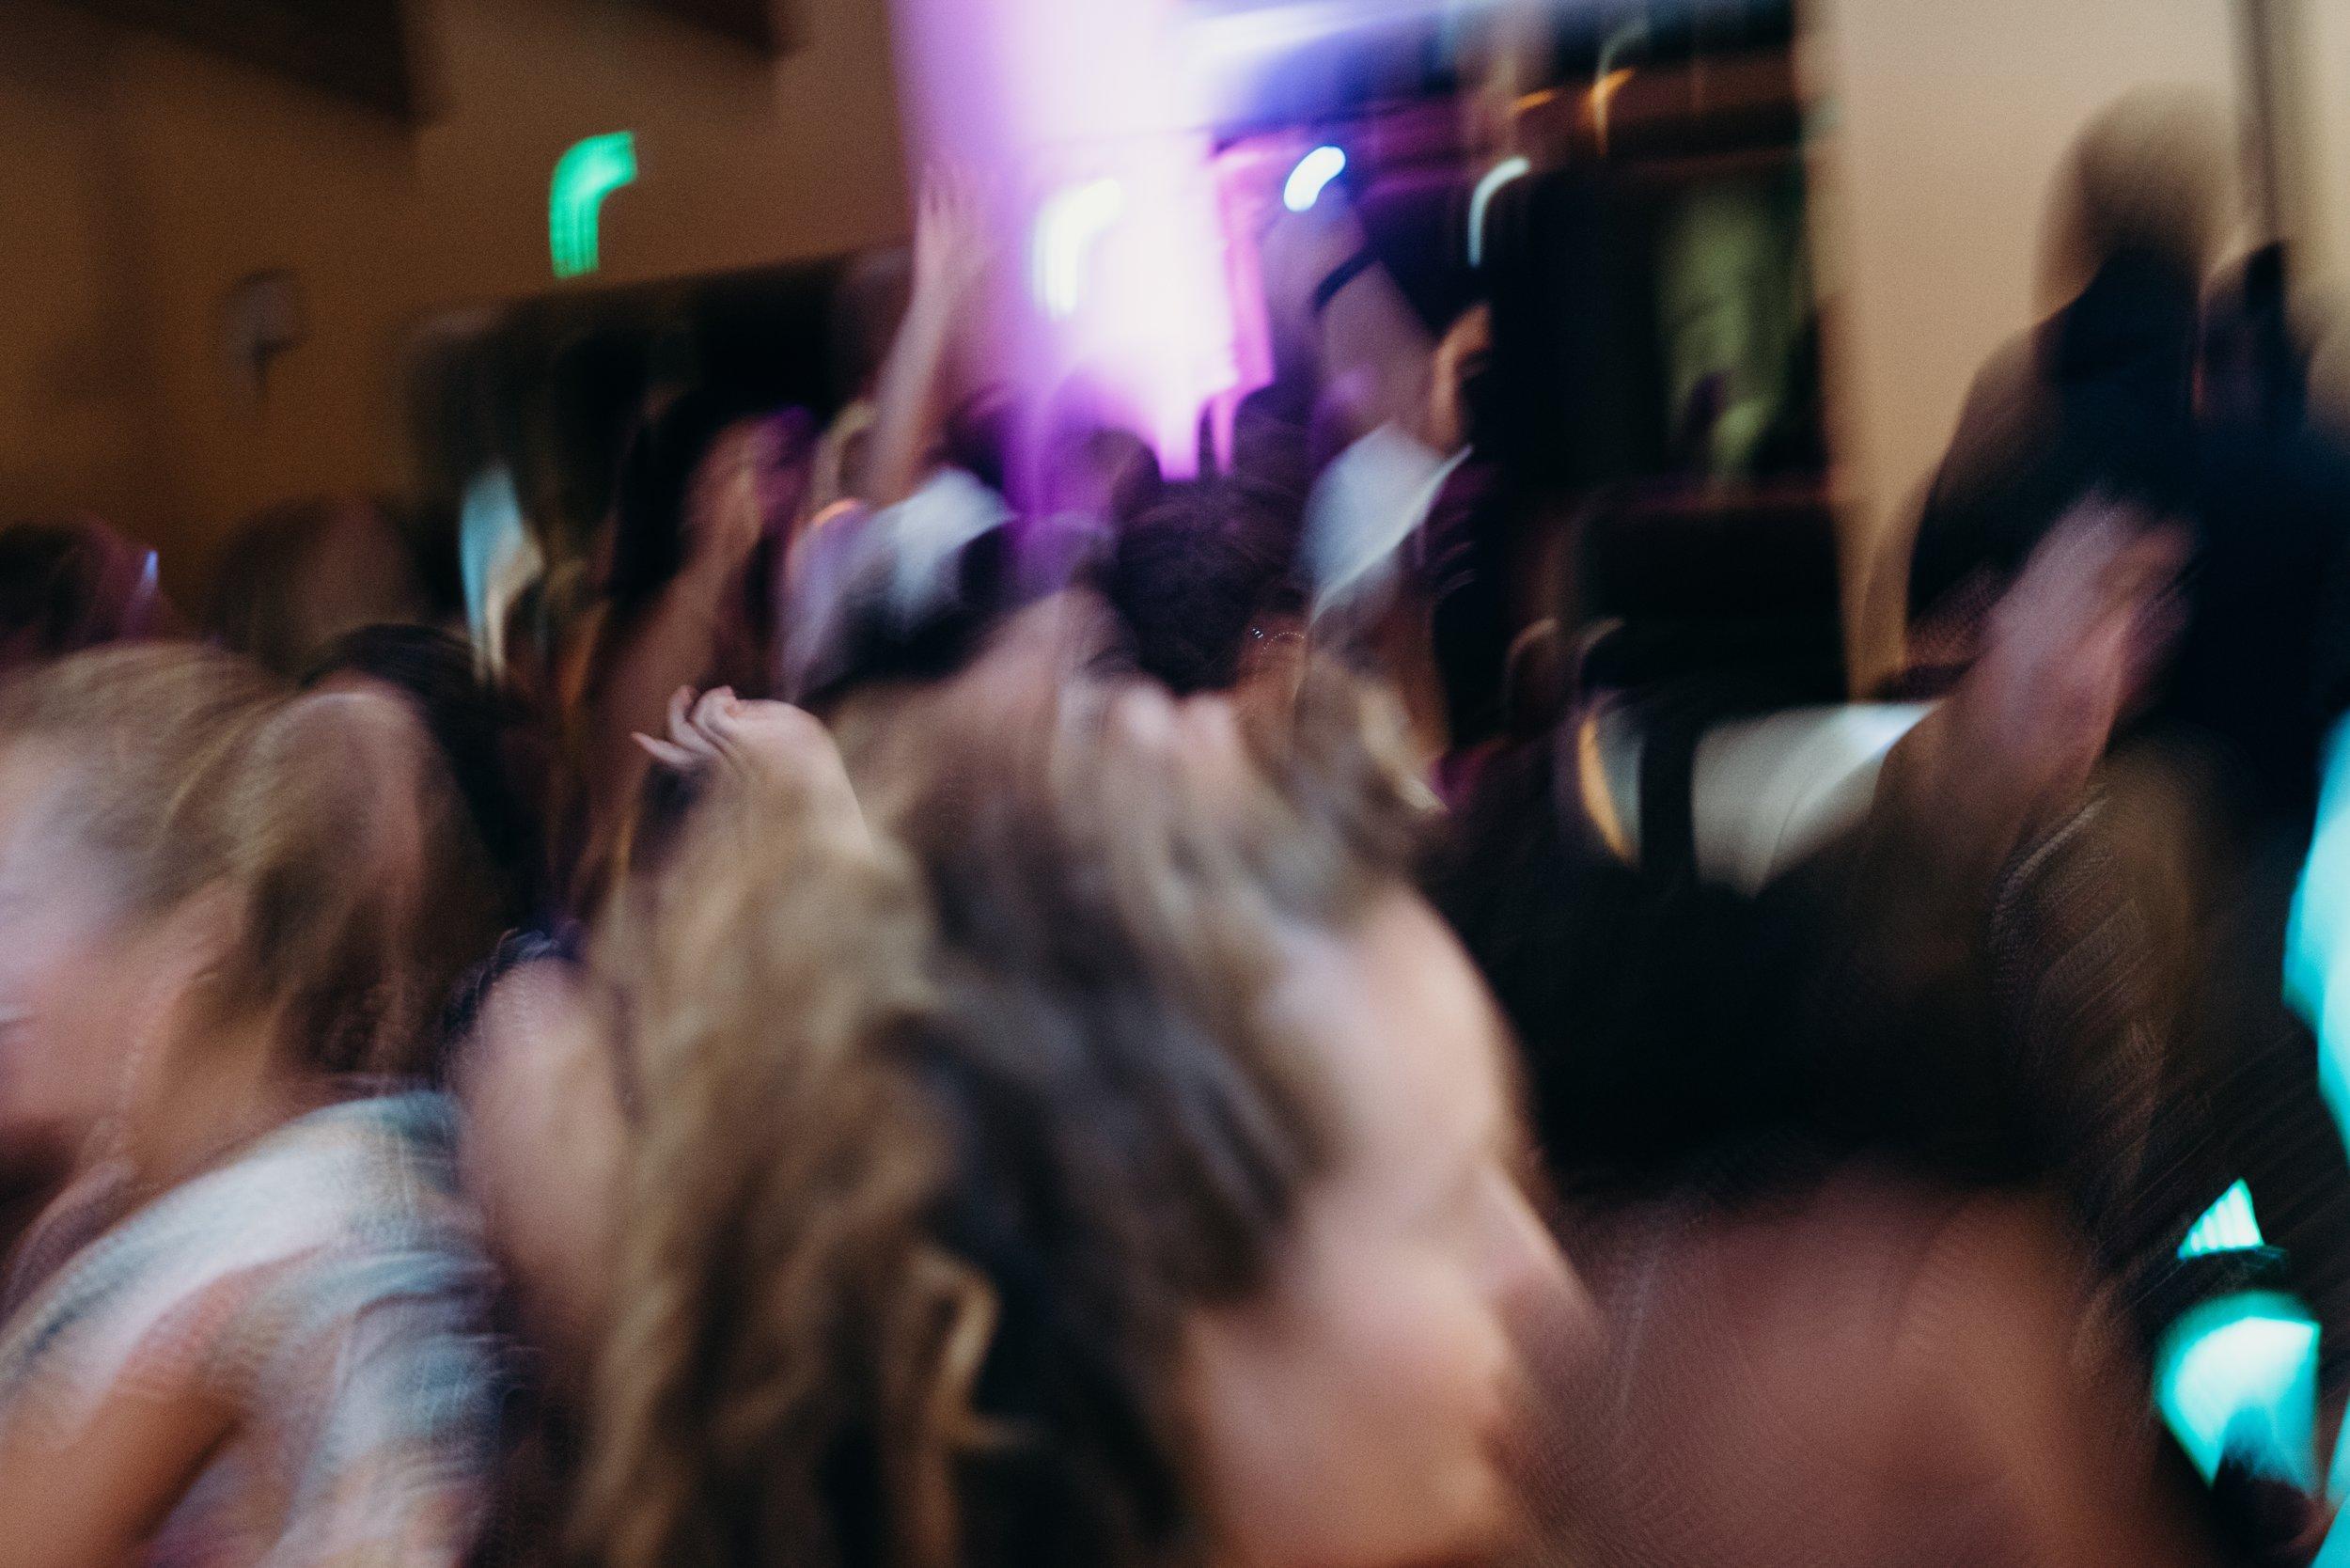 10 Dancing-22.jpeg